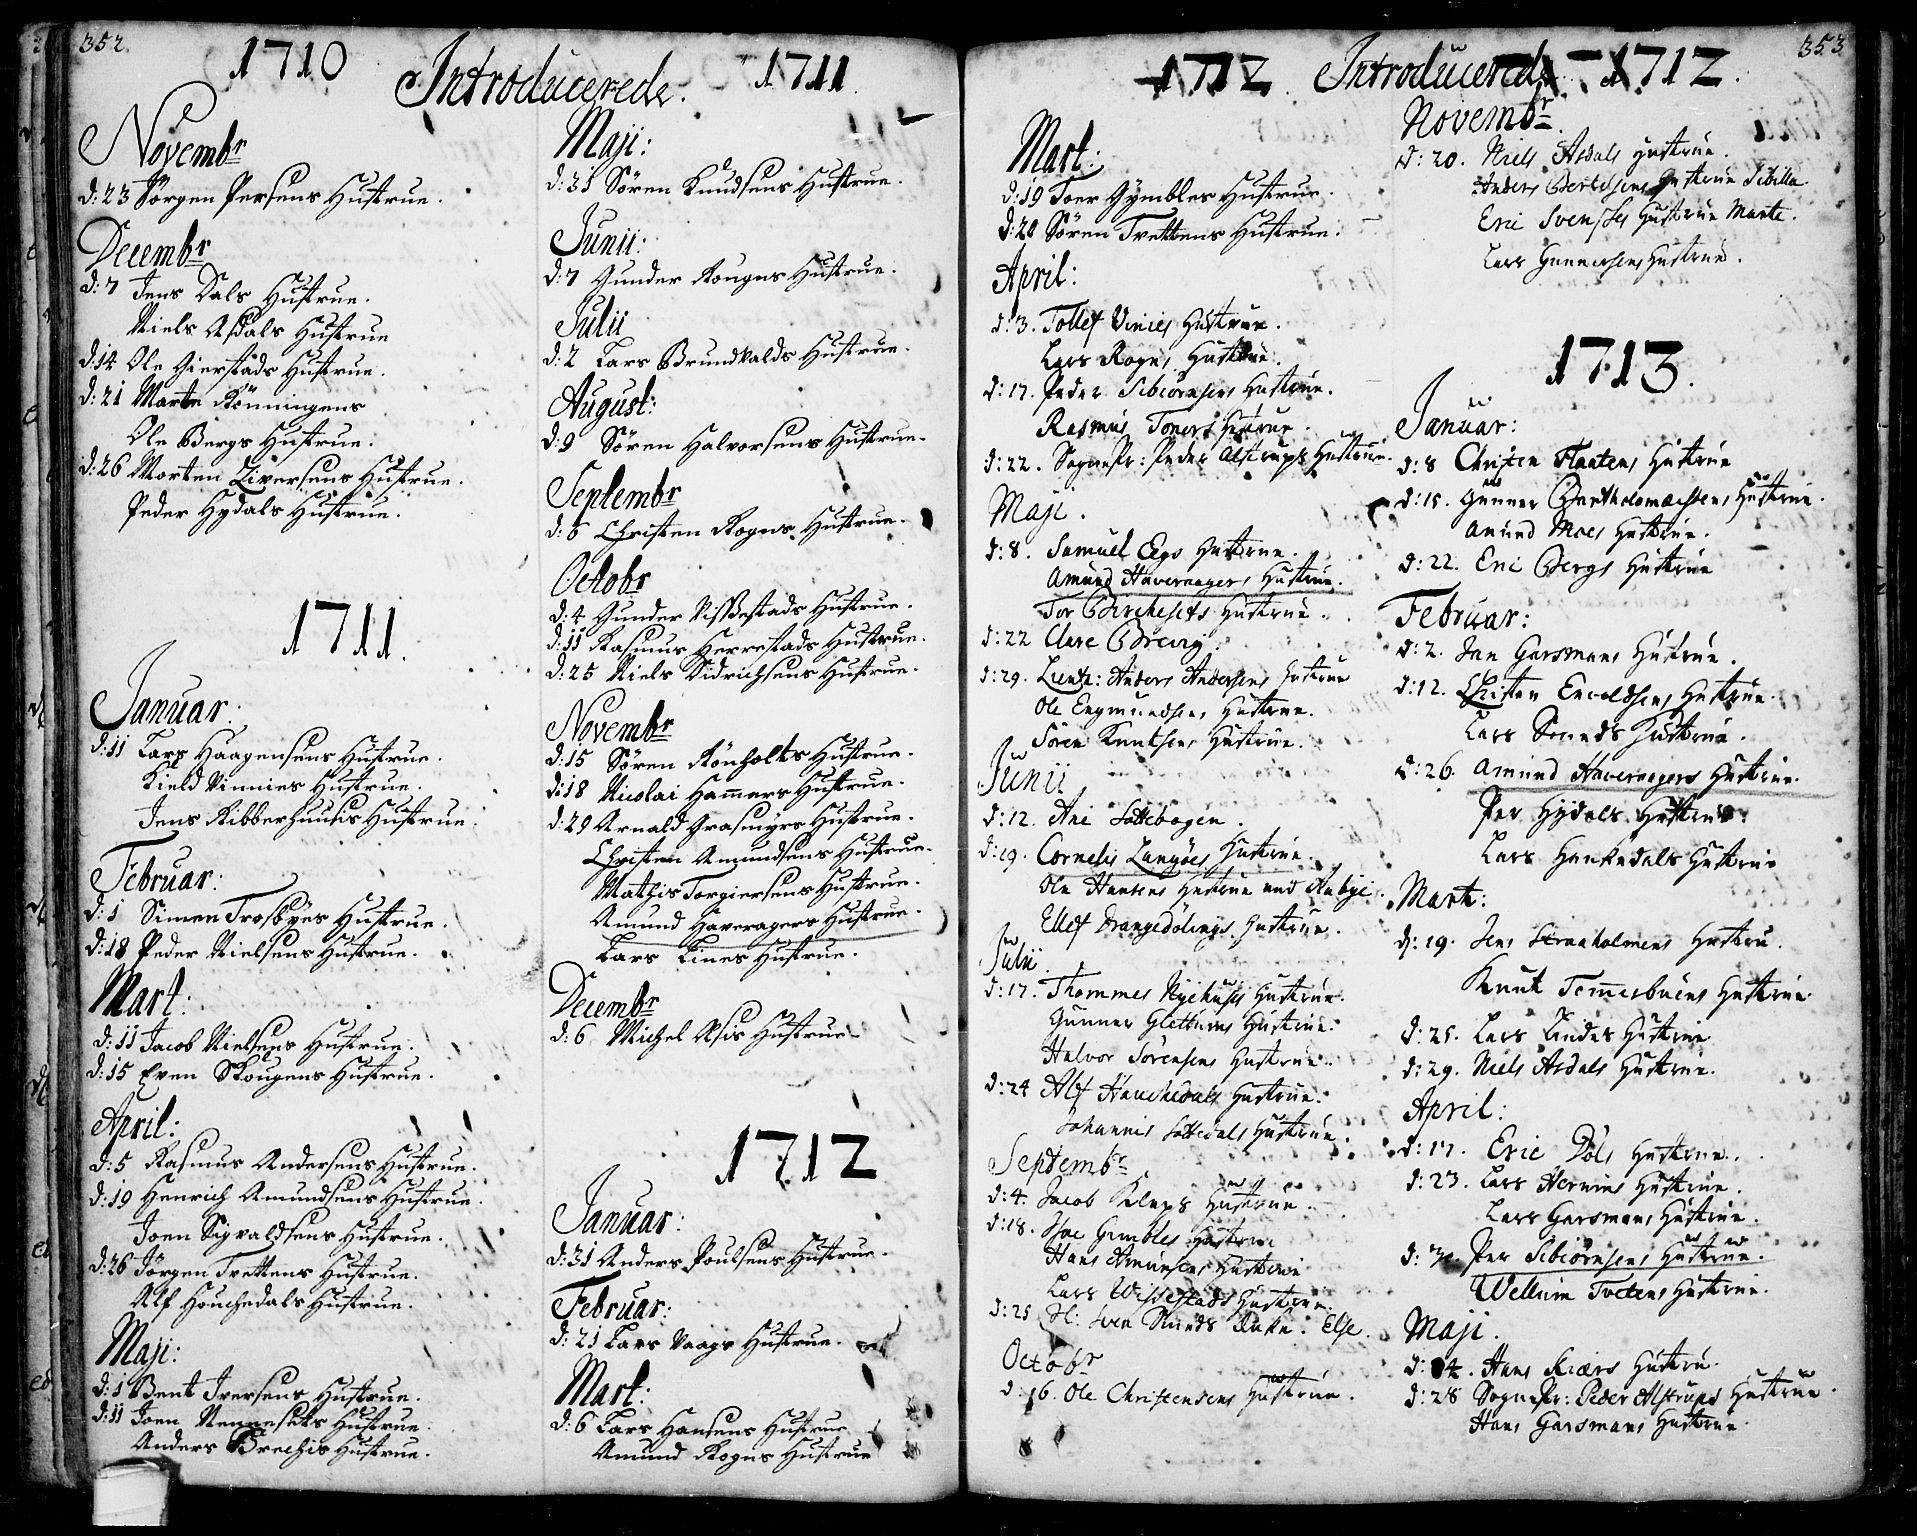 SAKO, Bamble kirkebøker, F/Fa/L0001: Ministerialbok nr. I 1, 1702-1774, s. 352-353